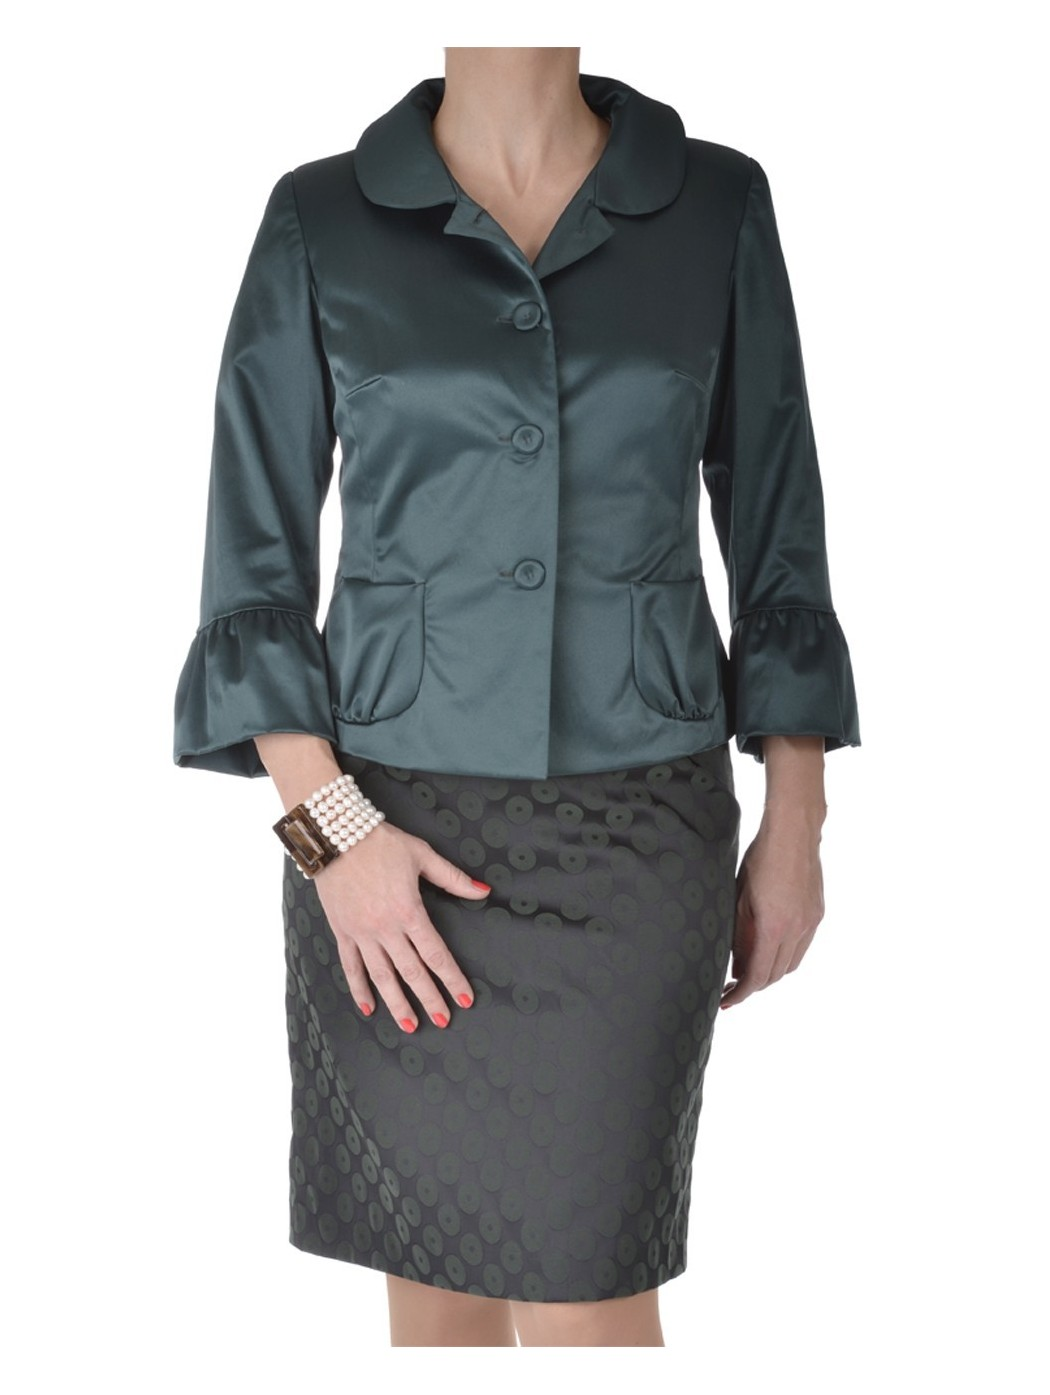 Zielona sukienka satynowa i kurtka Moonlight krople